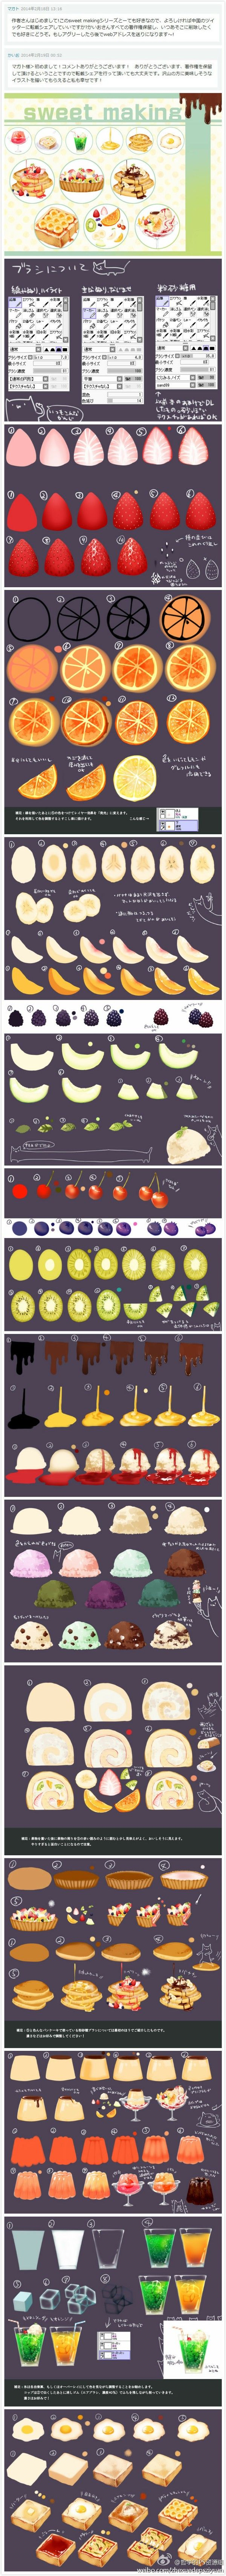 Digtially painting food - step by step examples.